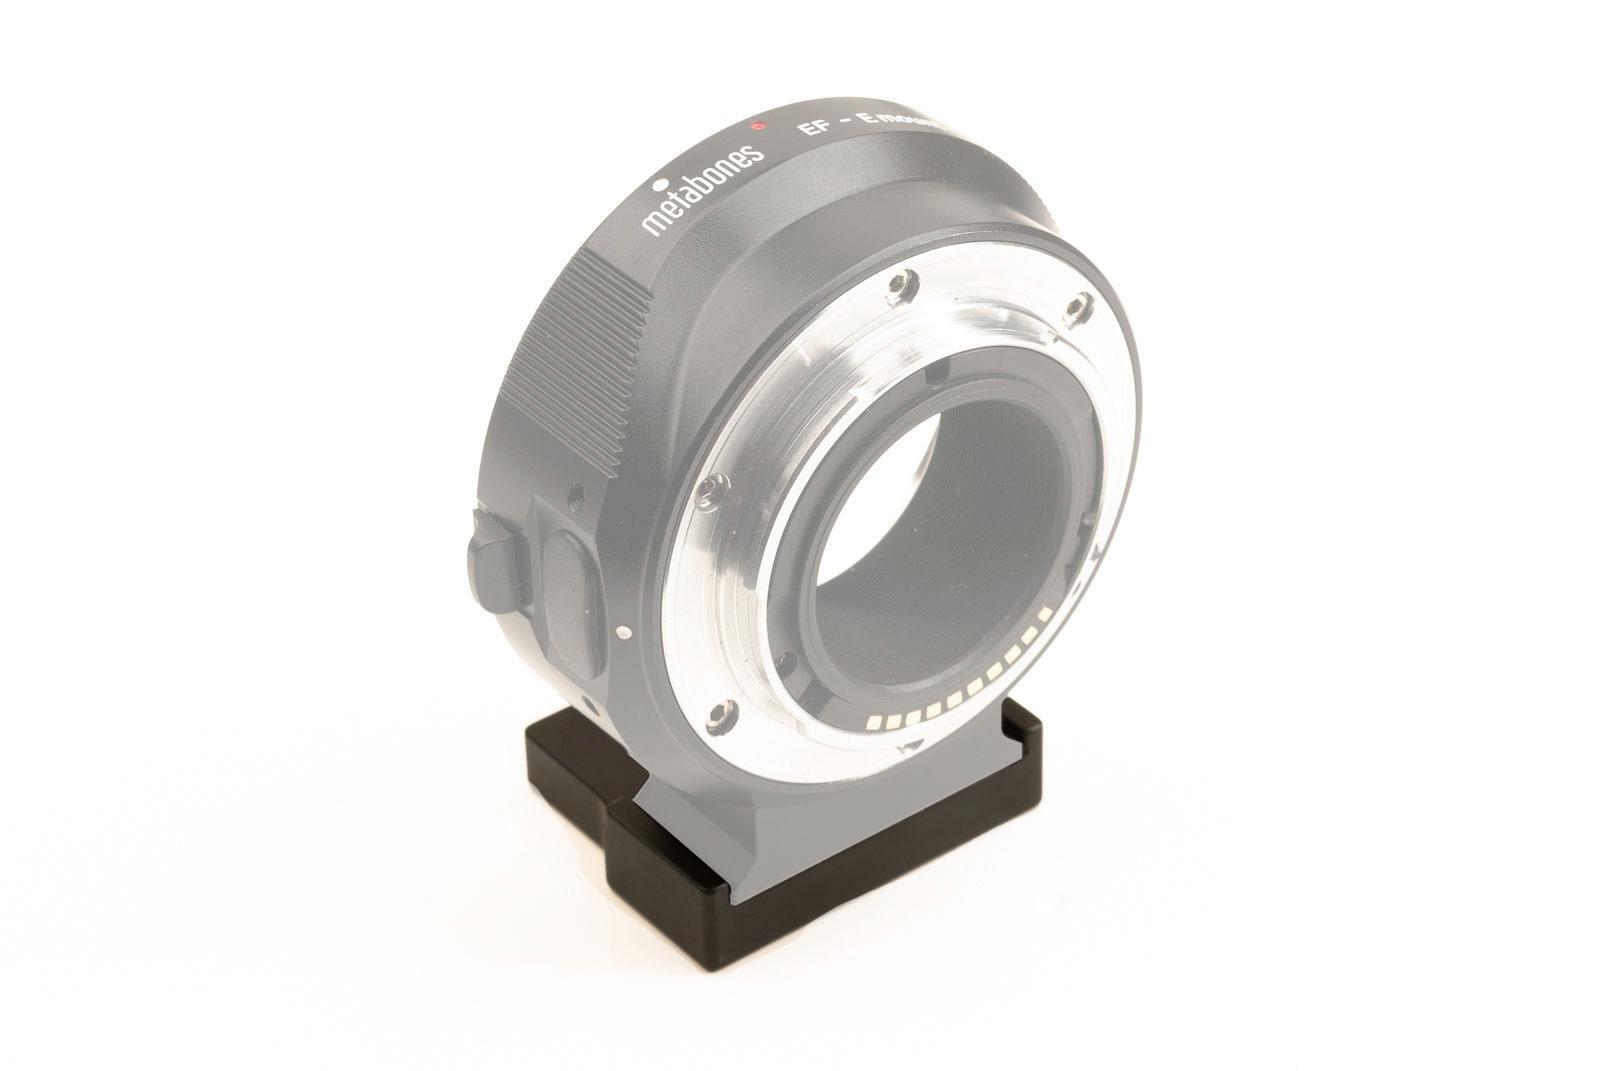 Hejnar Extender Spacer on Metabones Adapter facing forward